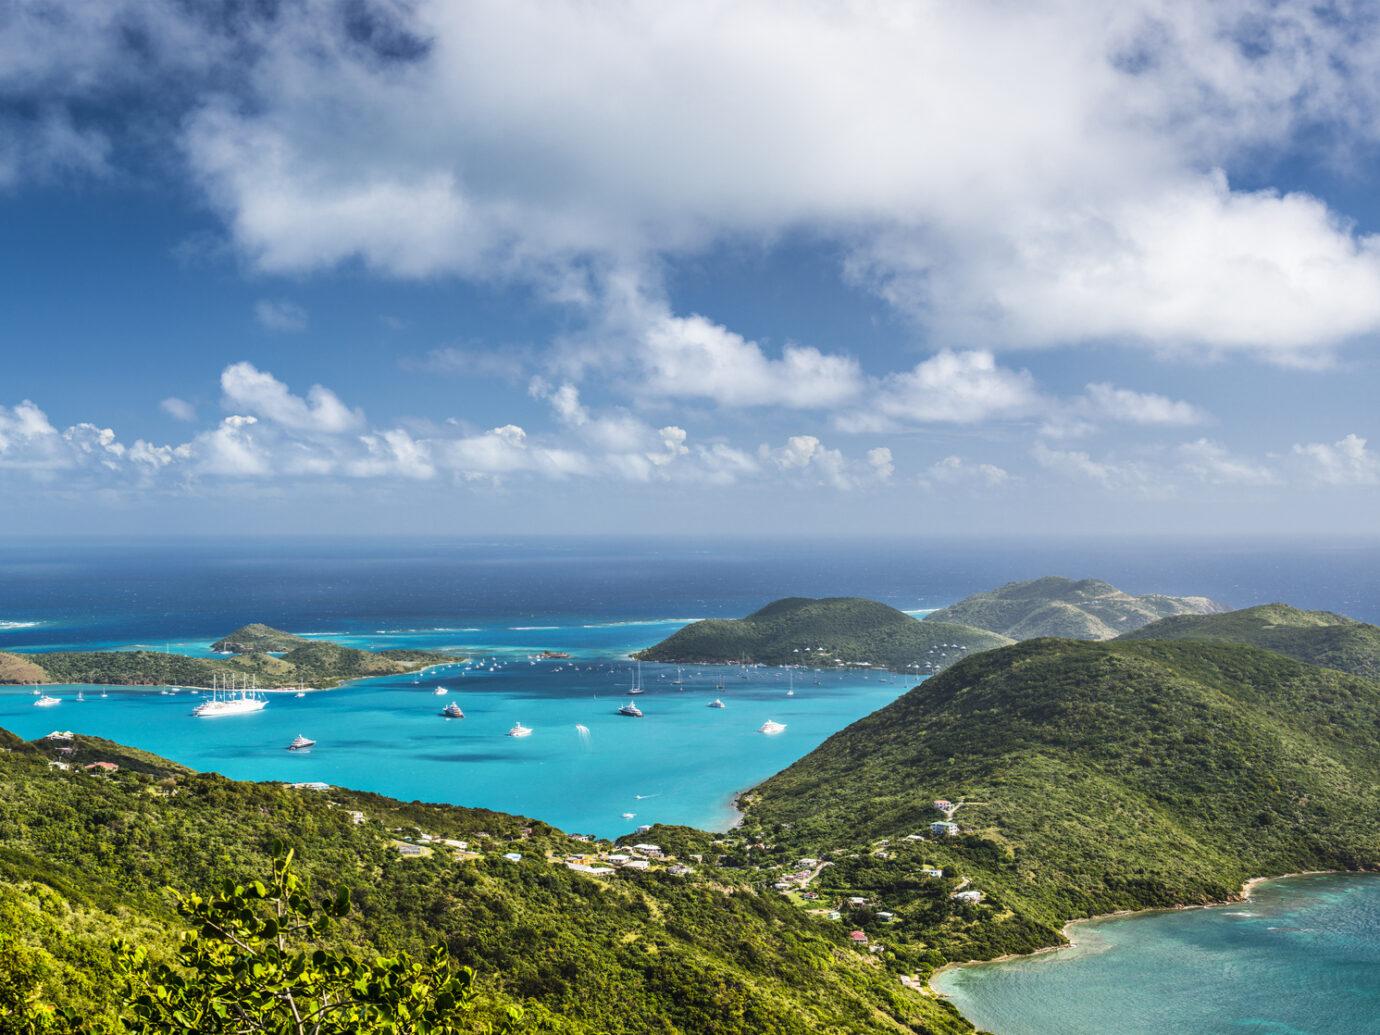 Virgin Gorda in the British Virgin Islands of the Carribean.